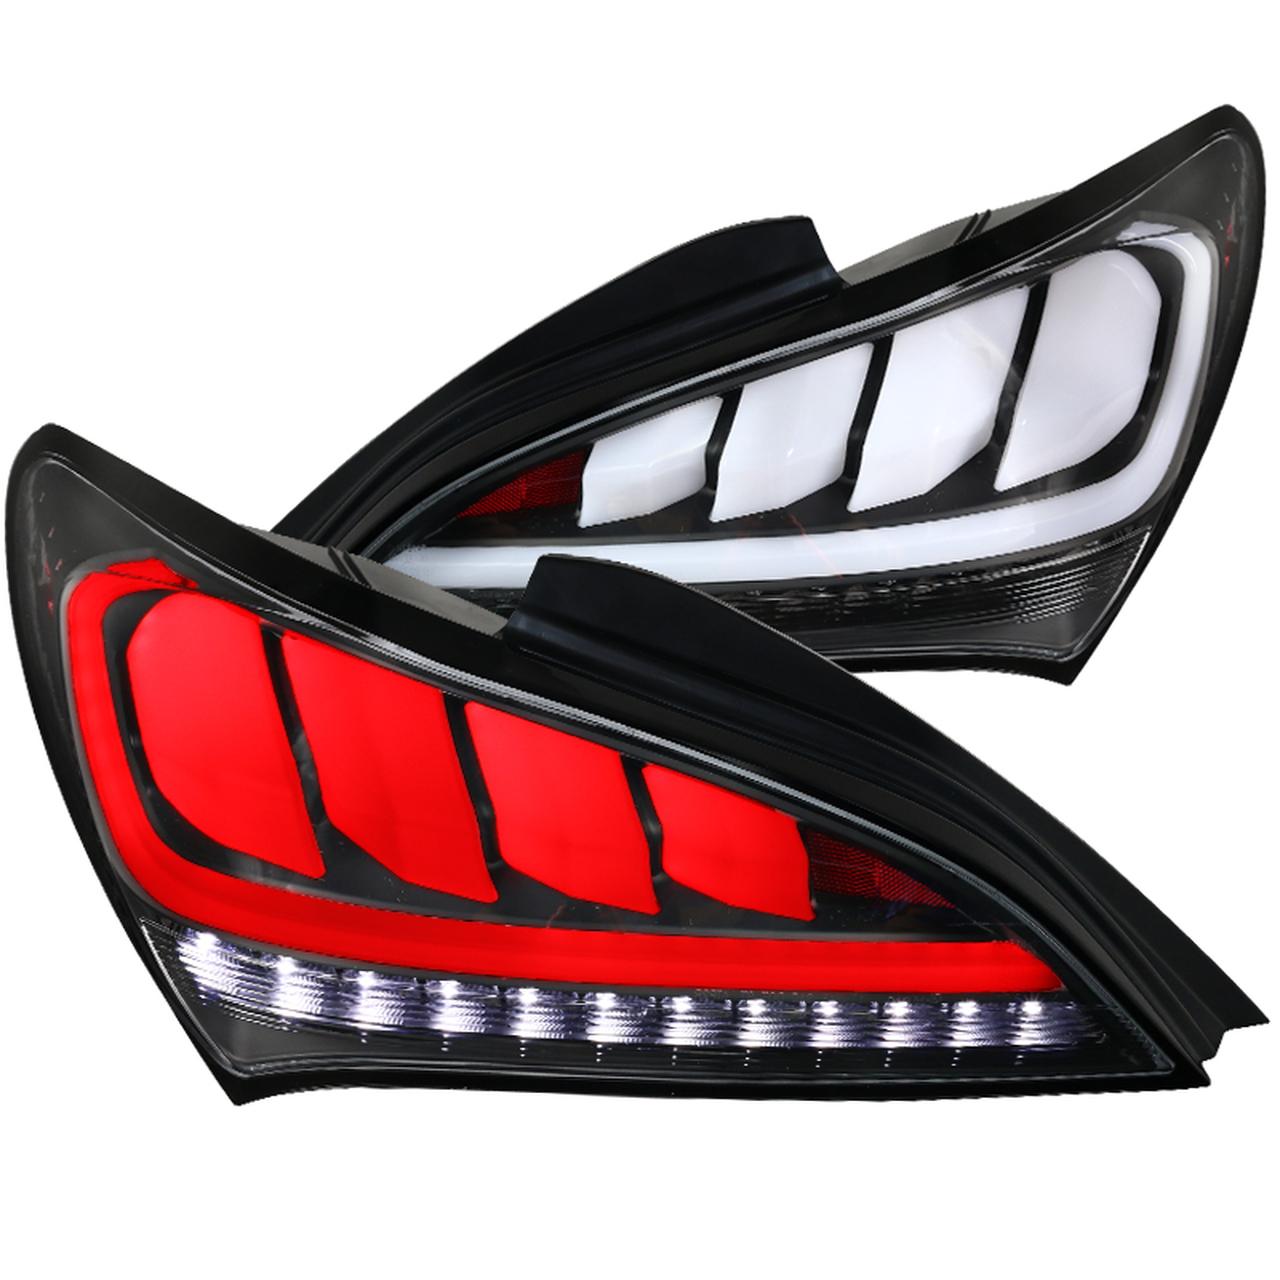 Spec D Tuning Black Sequential Led Tail Lights Lt Gens210jmled Tm